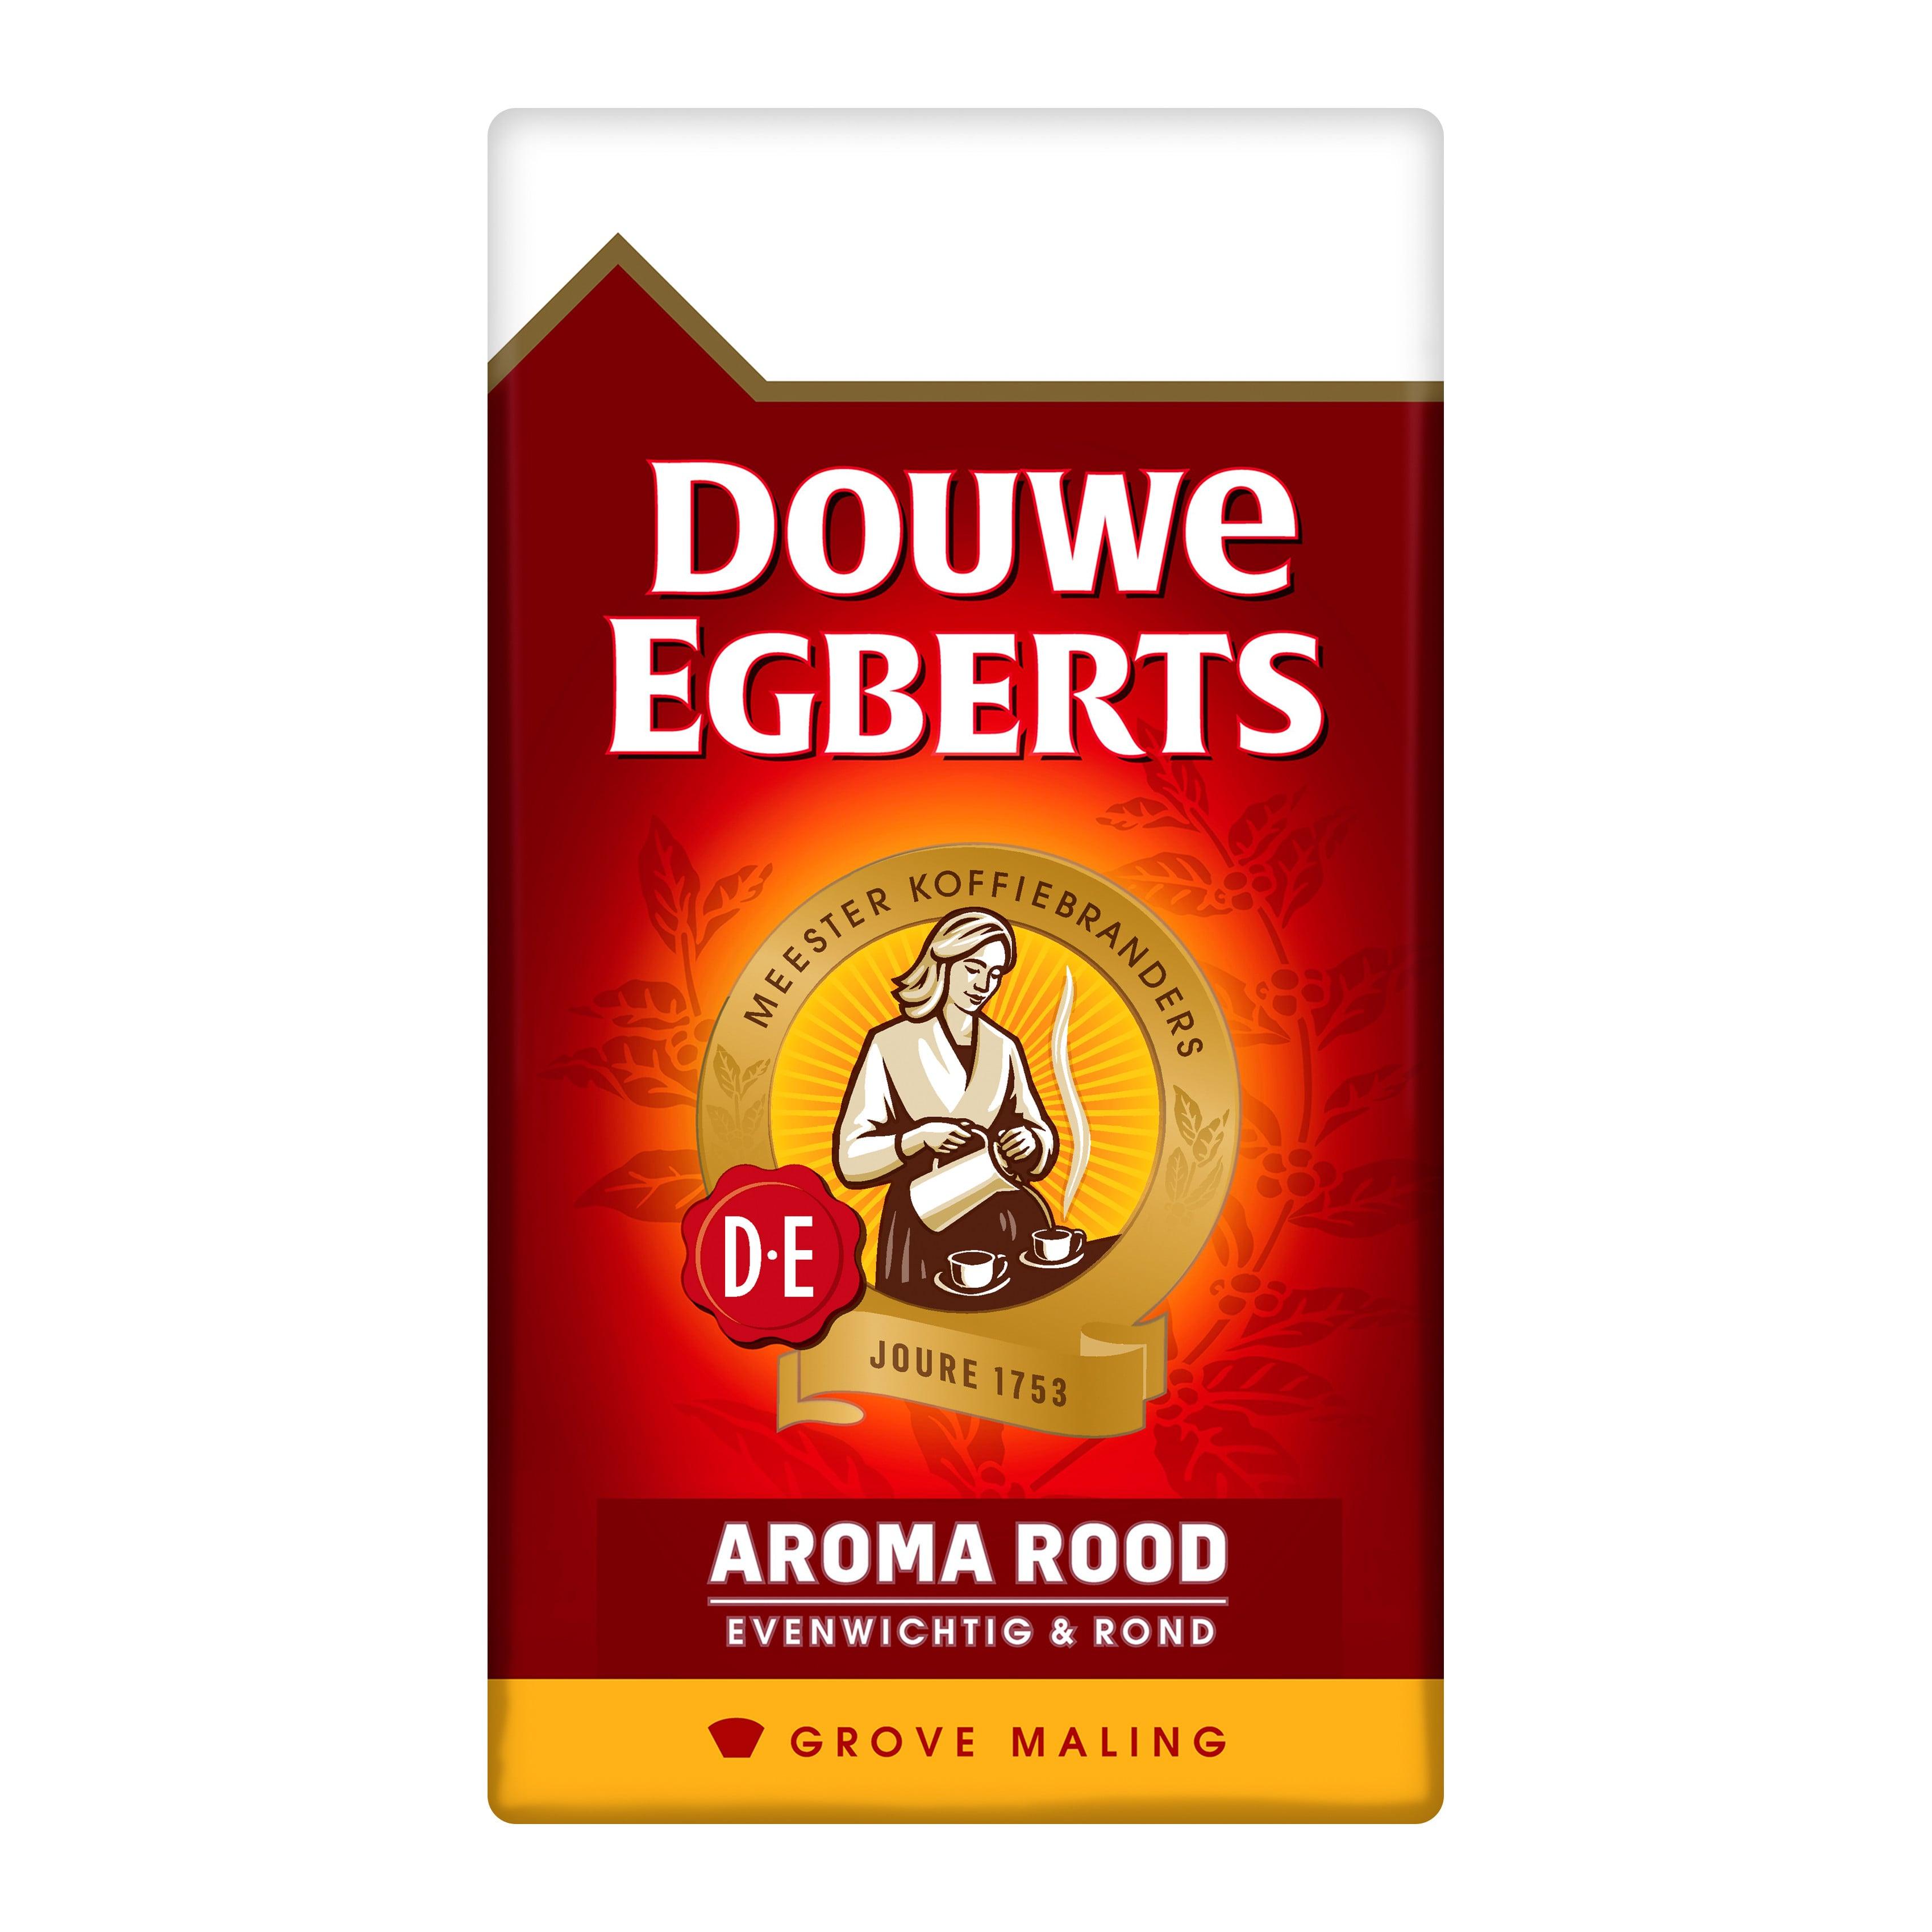 Douwe Egberts | Aroma Rood | Grove maling | Doos 6 x 500 gram